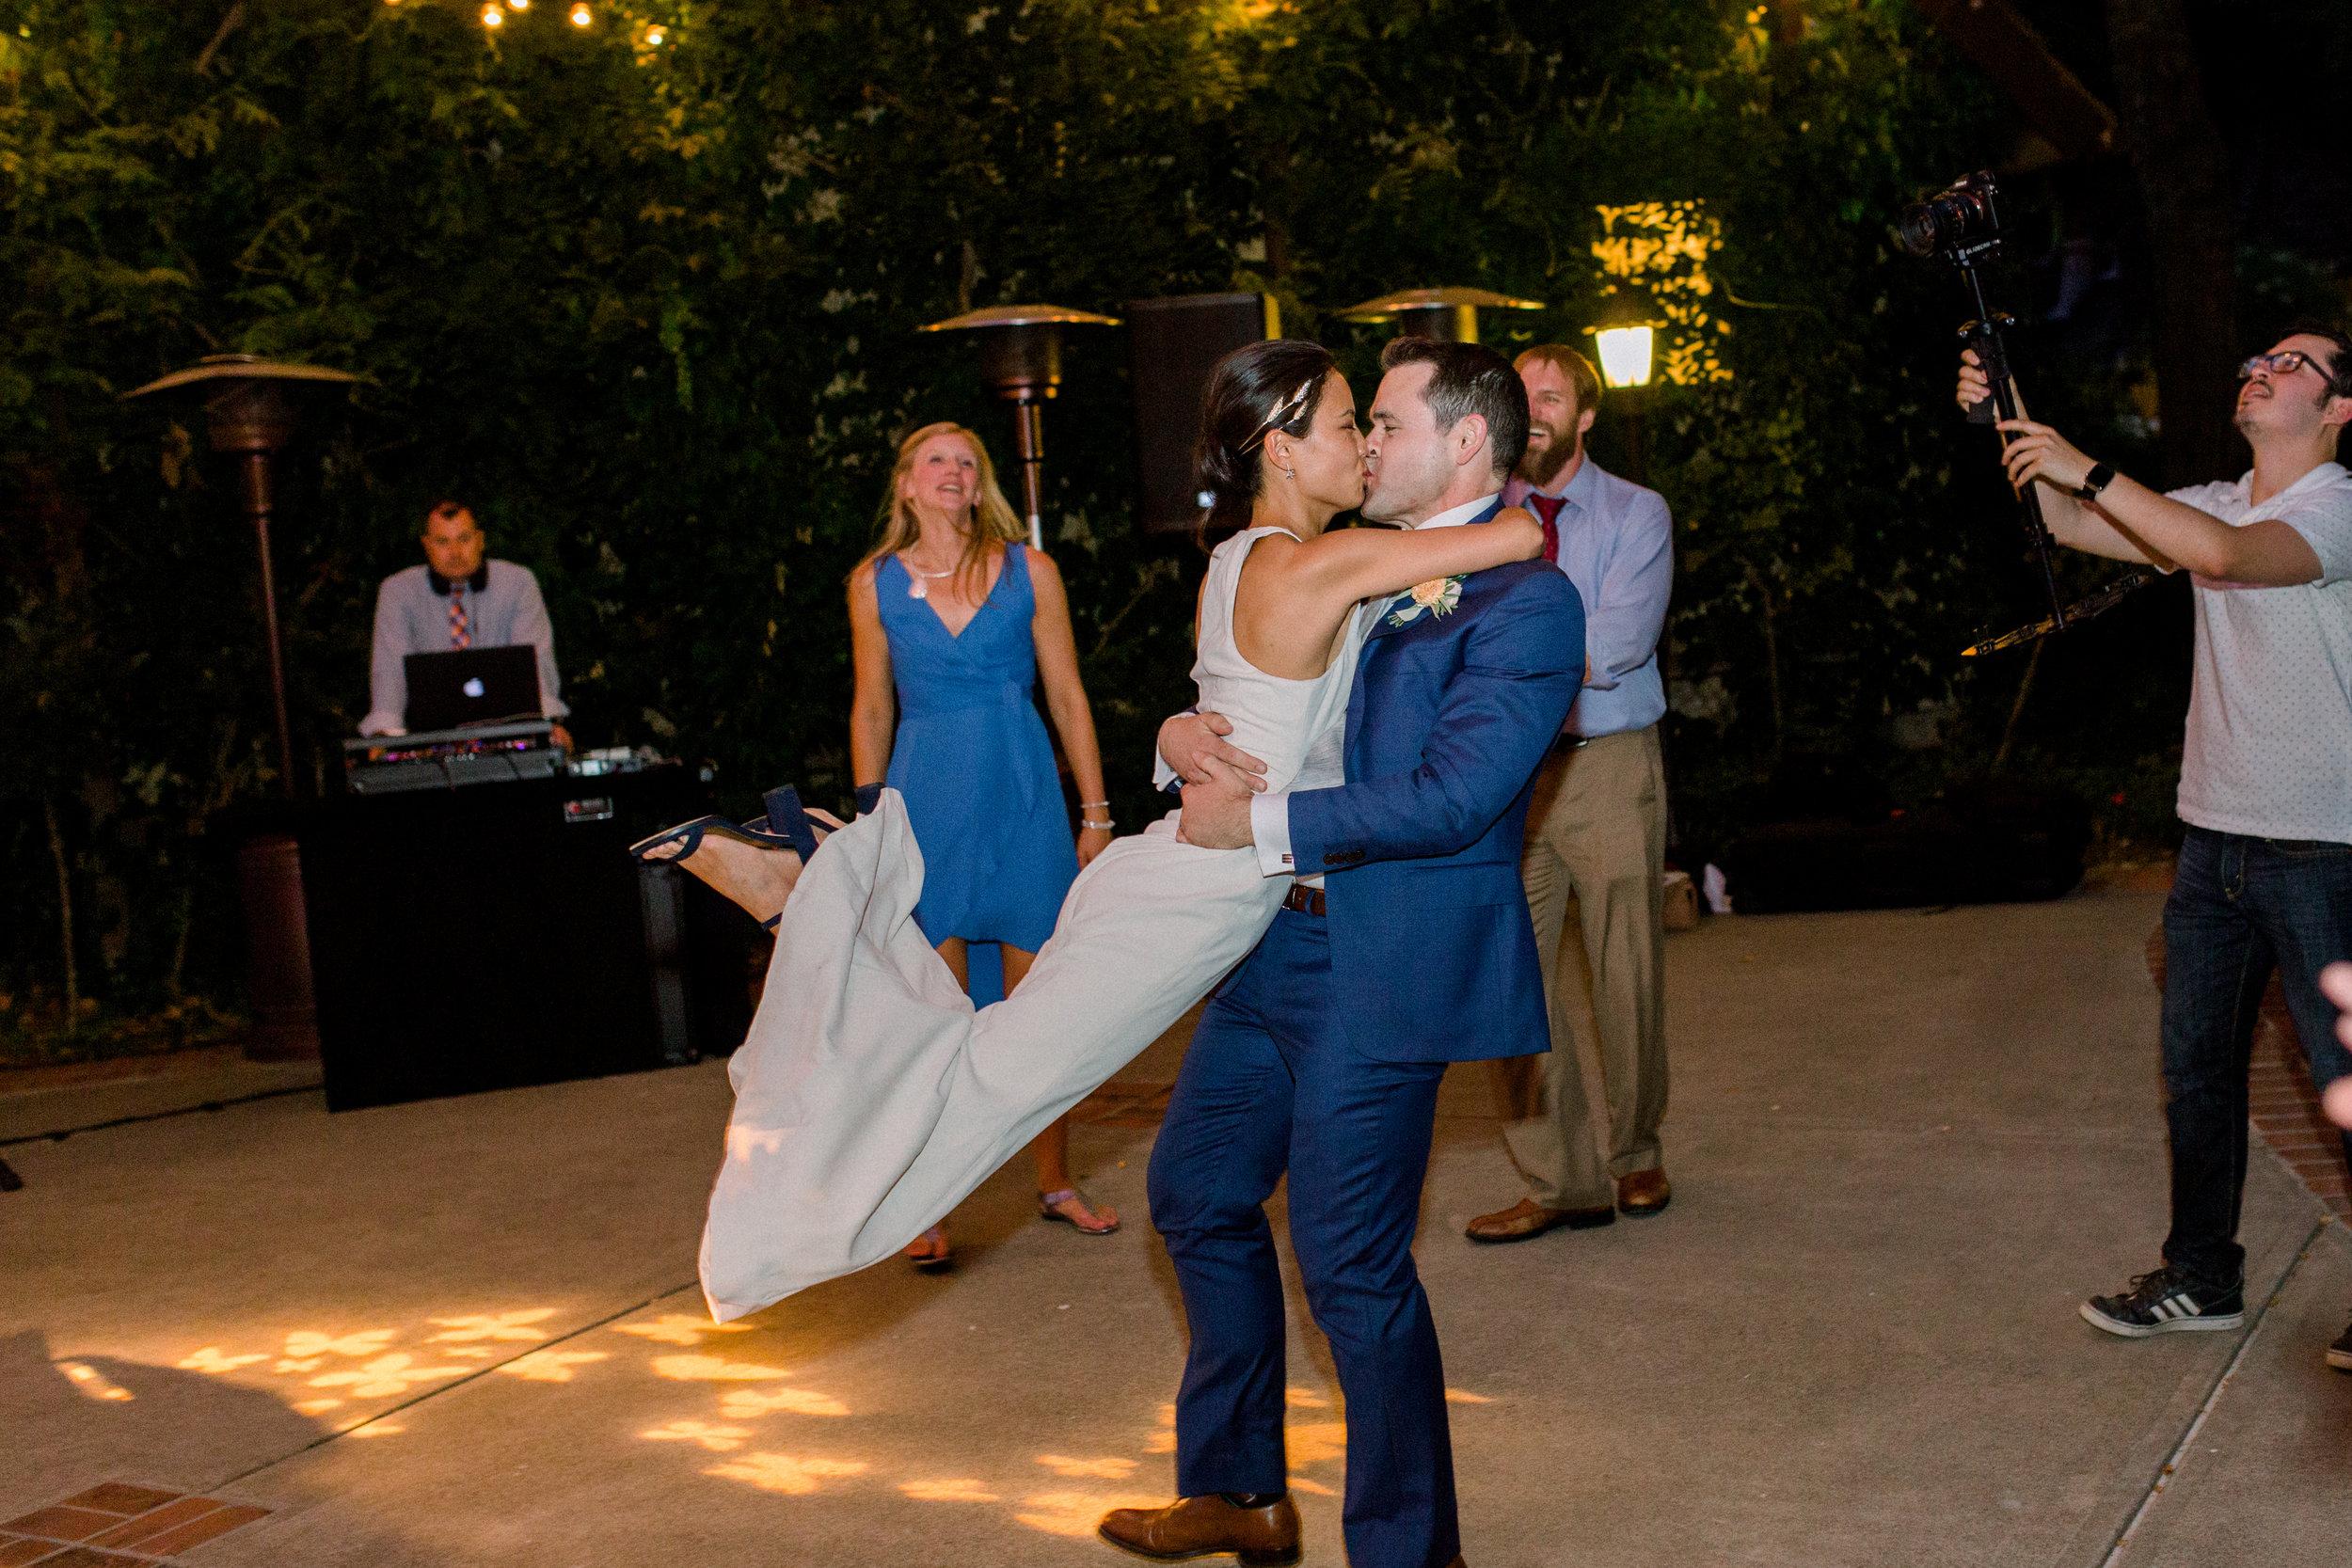 Harvest-inn-wedding-in-napa-california-336.jpg